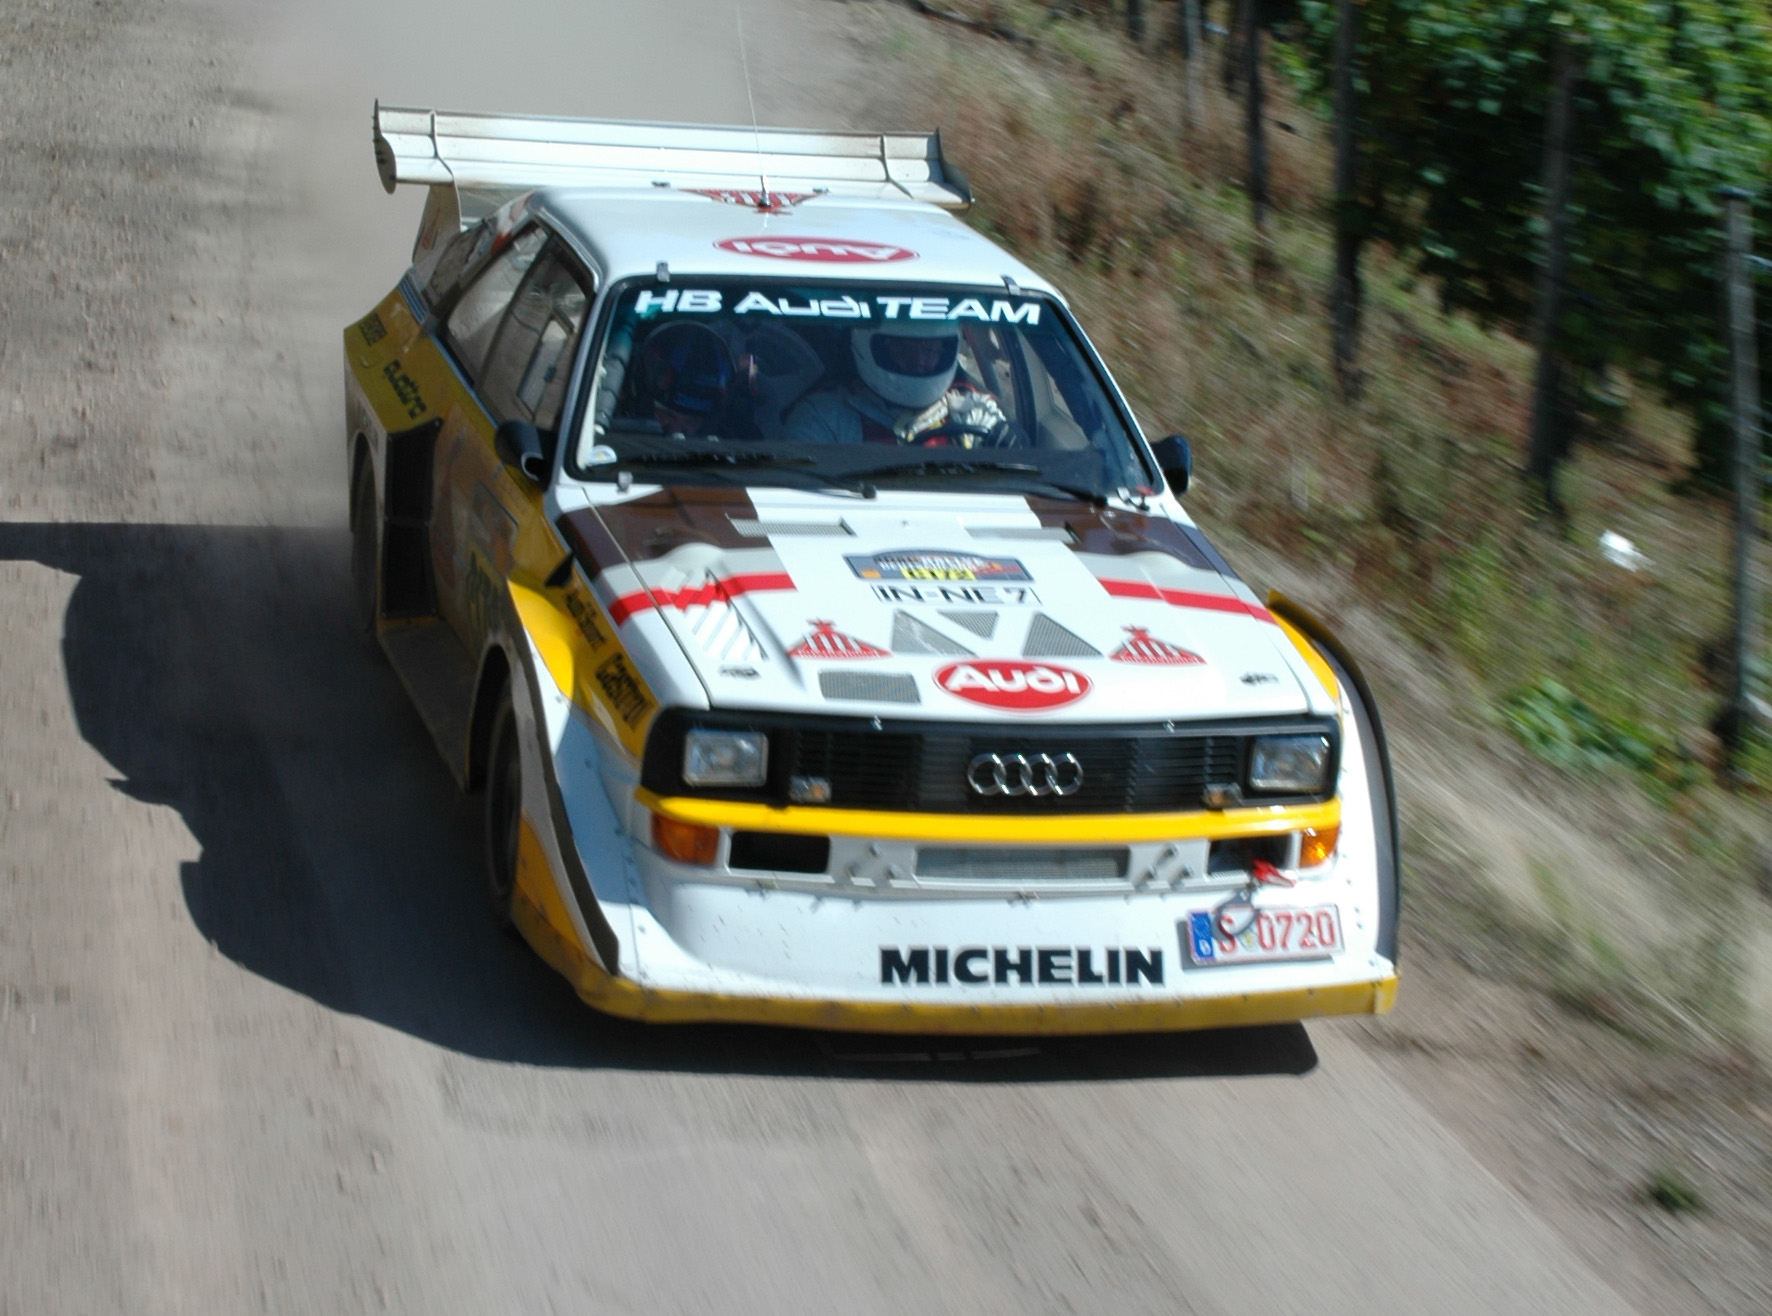 http://upload.wikimedia.org/wikipedia/commons/3/37/Audi_Quattro_-_2007_Rallye_Deutschland_%28cropped%29.jpg